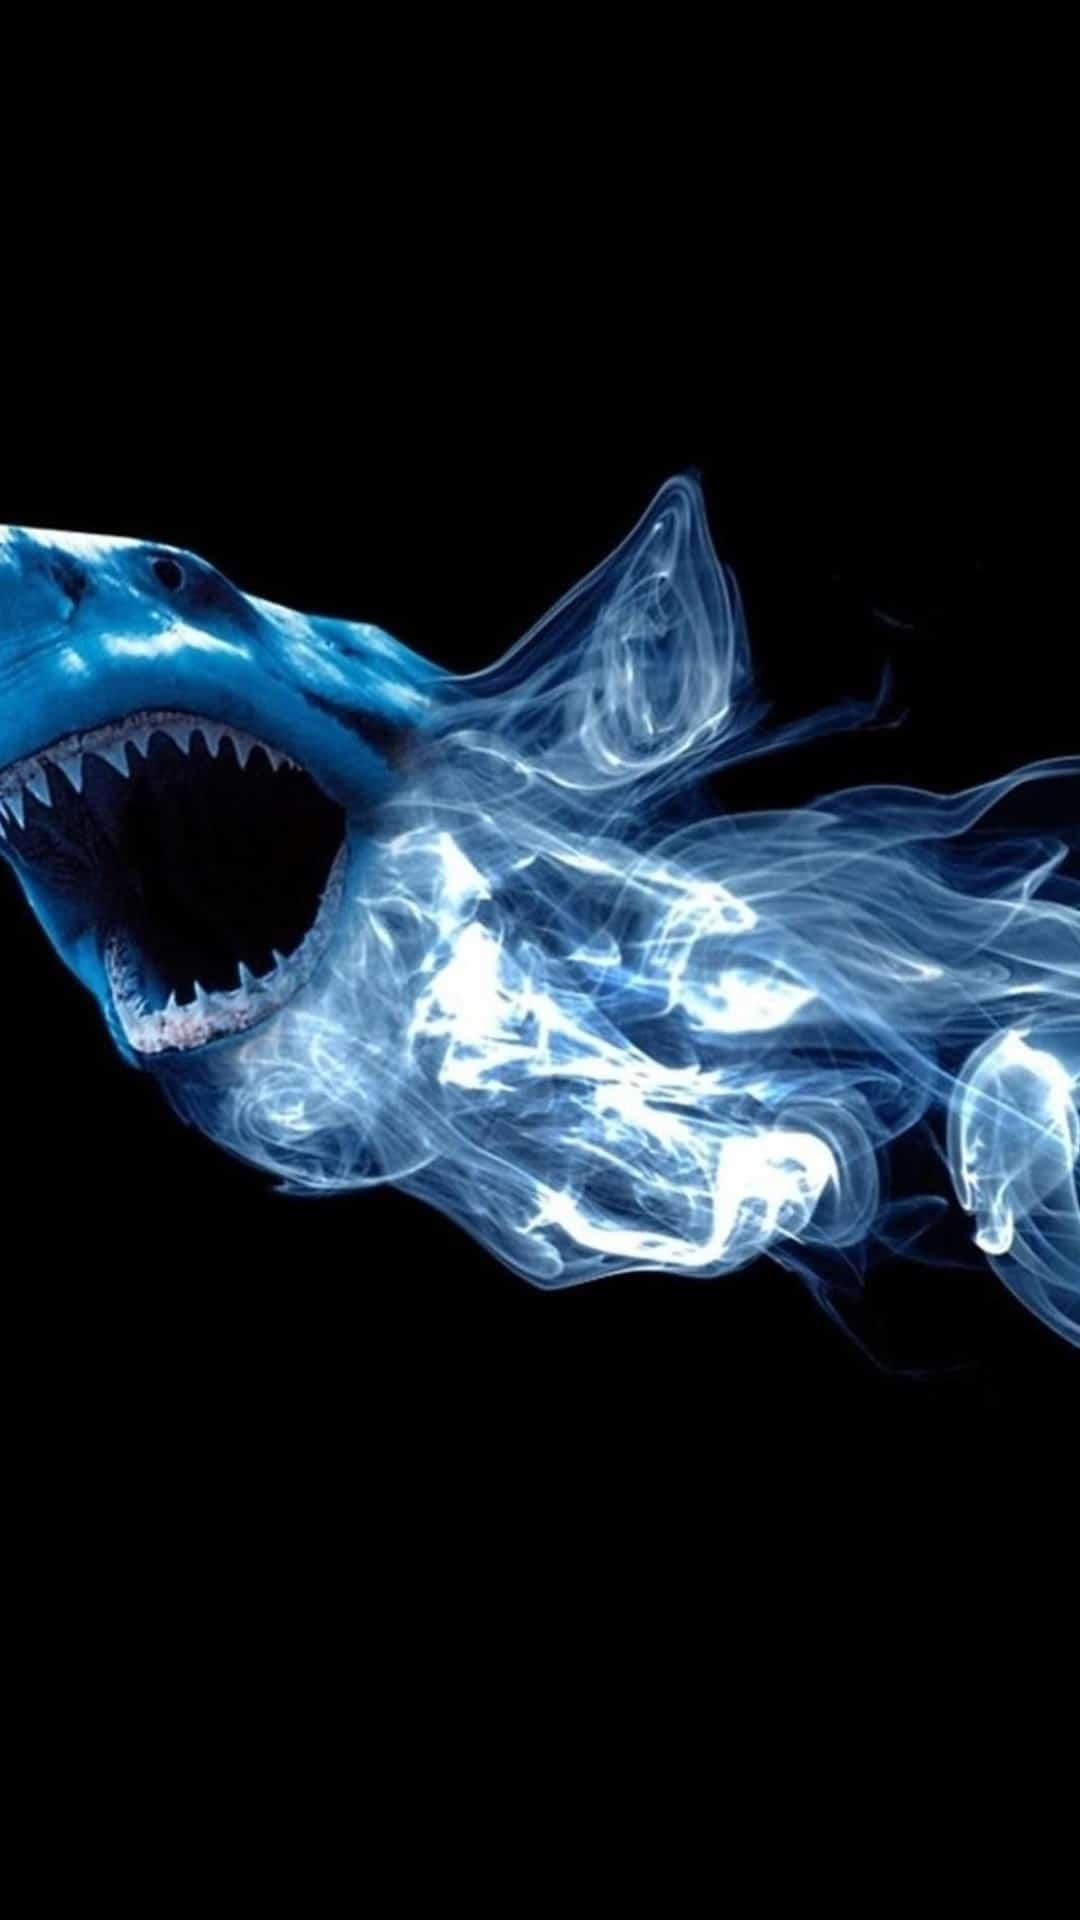 Abstract Shark Neon Light Smoke Android Wallpaper